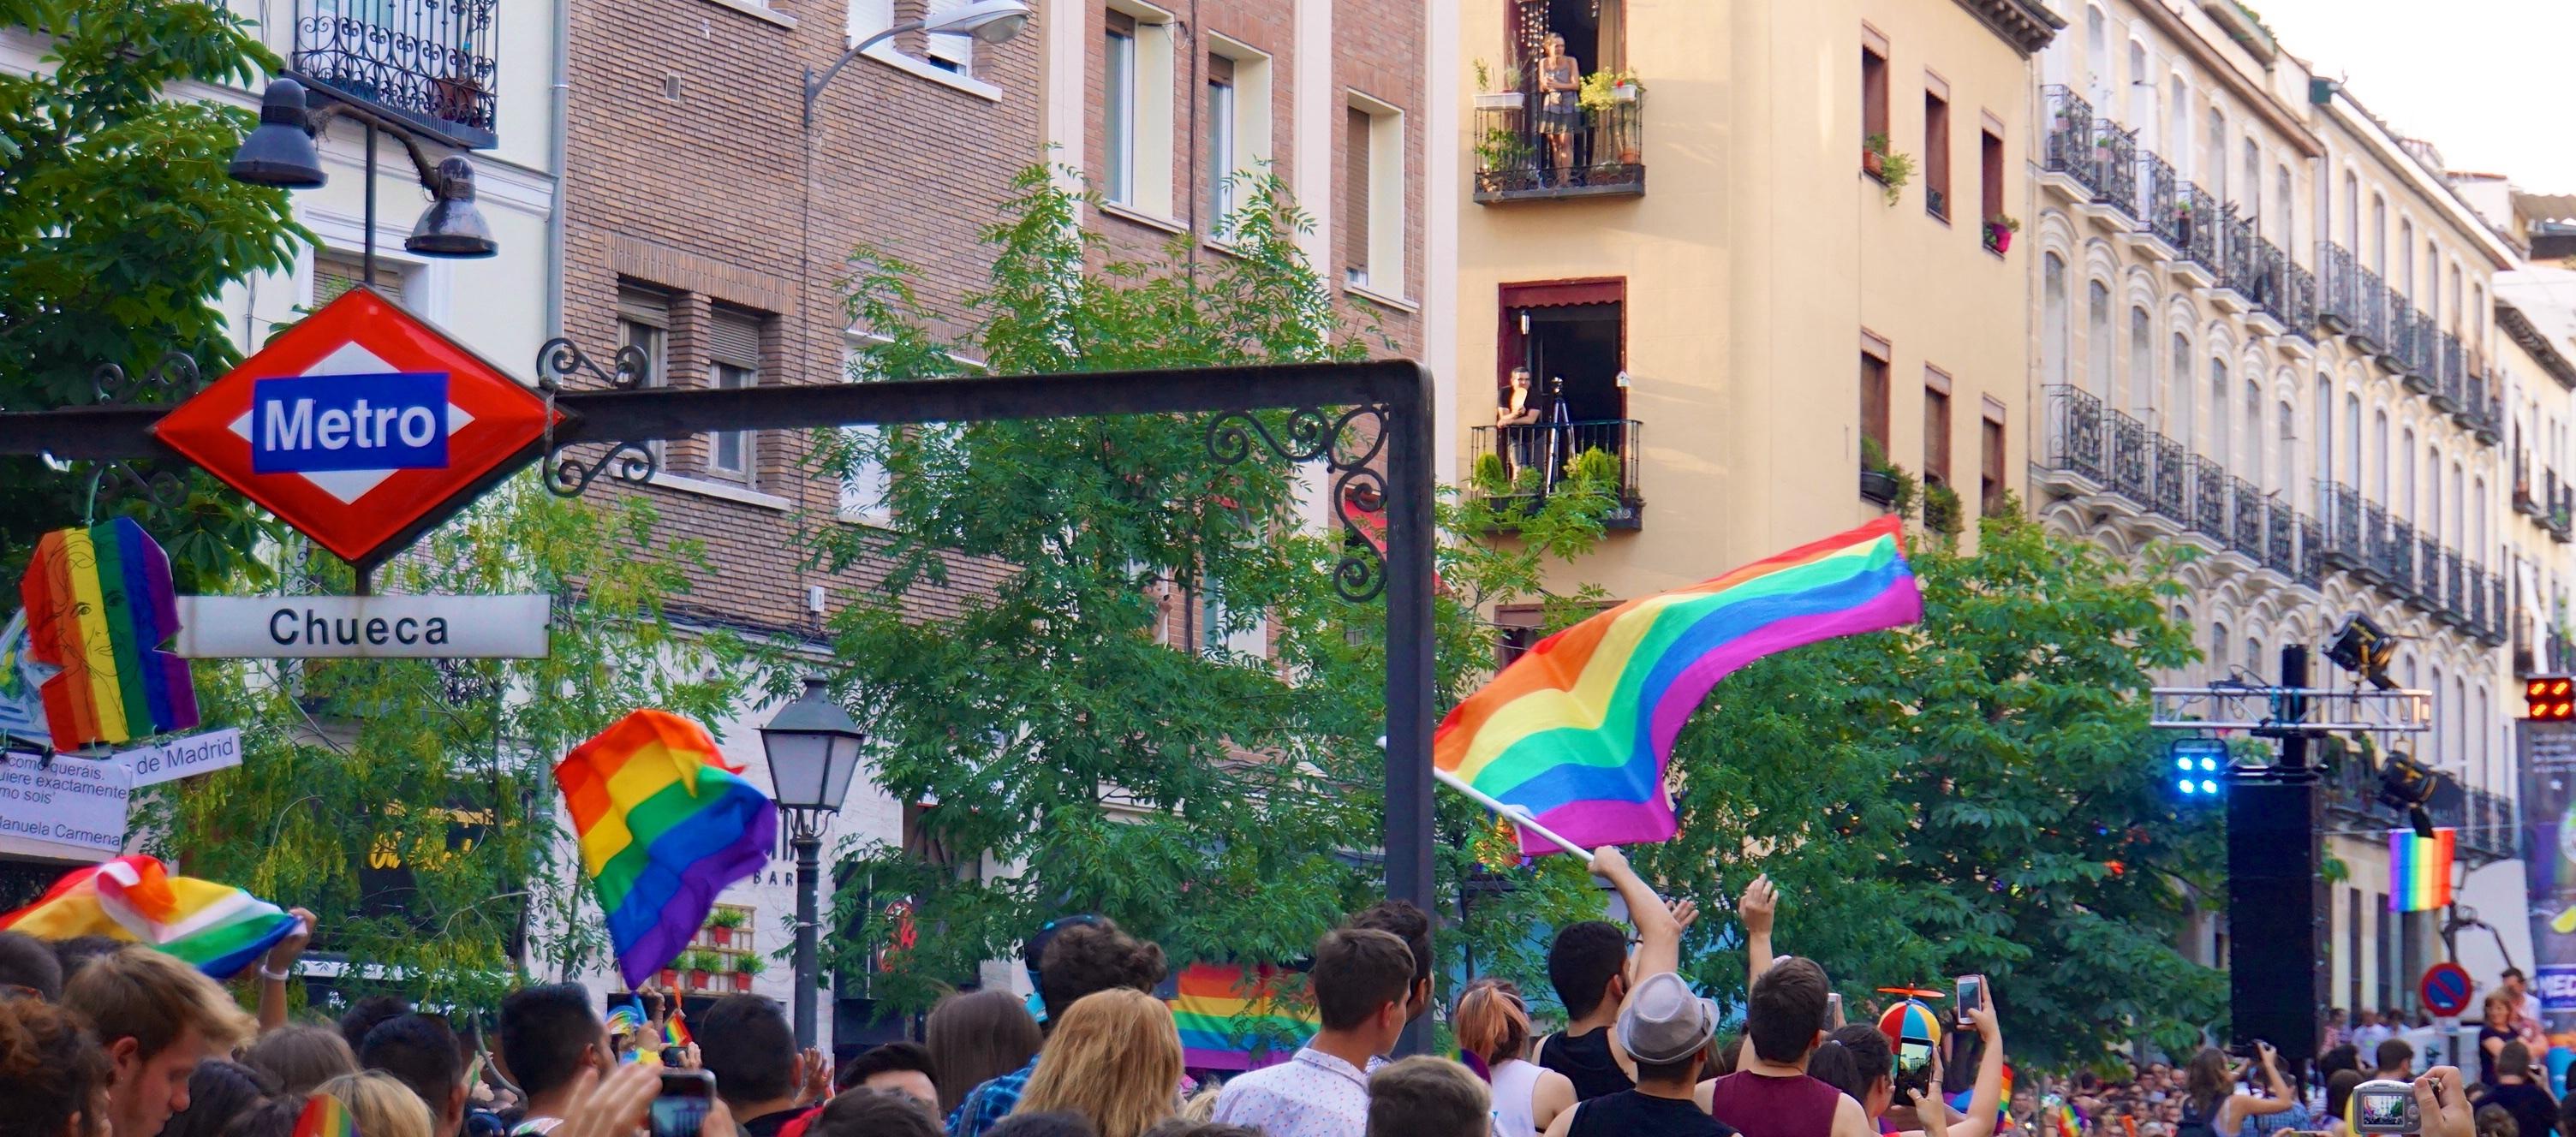 Flickr pools TRAVEL Photography! LGBT PRIDE Flickr tags bisexual rainbow flag gay pride 2015 chueca lesbian madrid spain transgender pride flag LGBTQ Sony